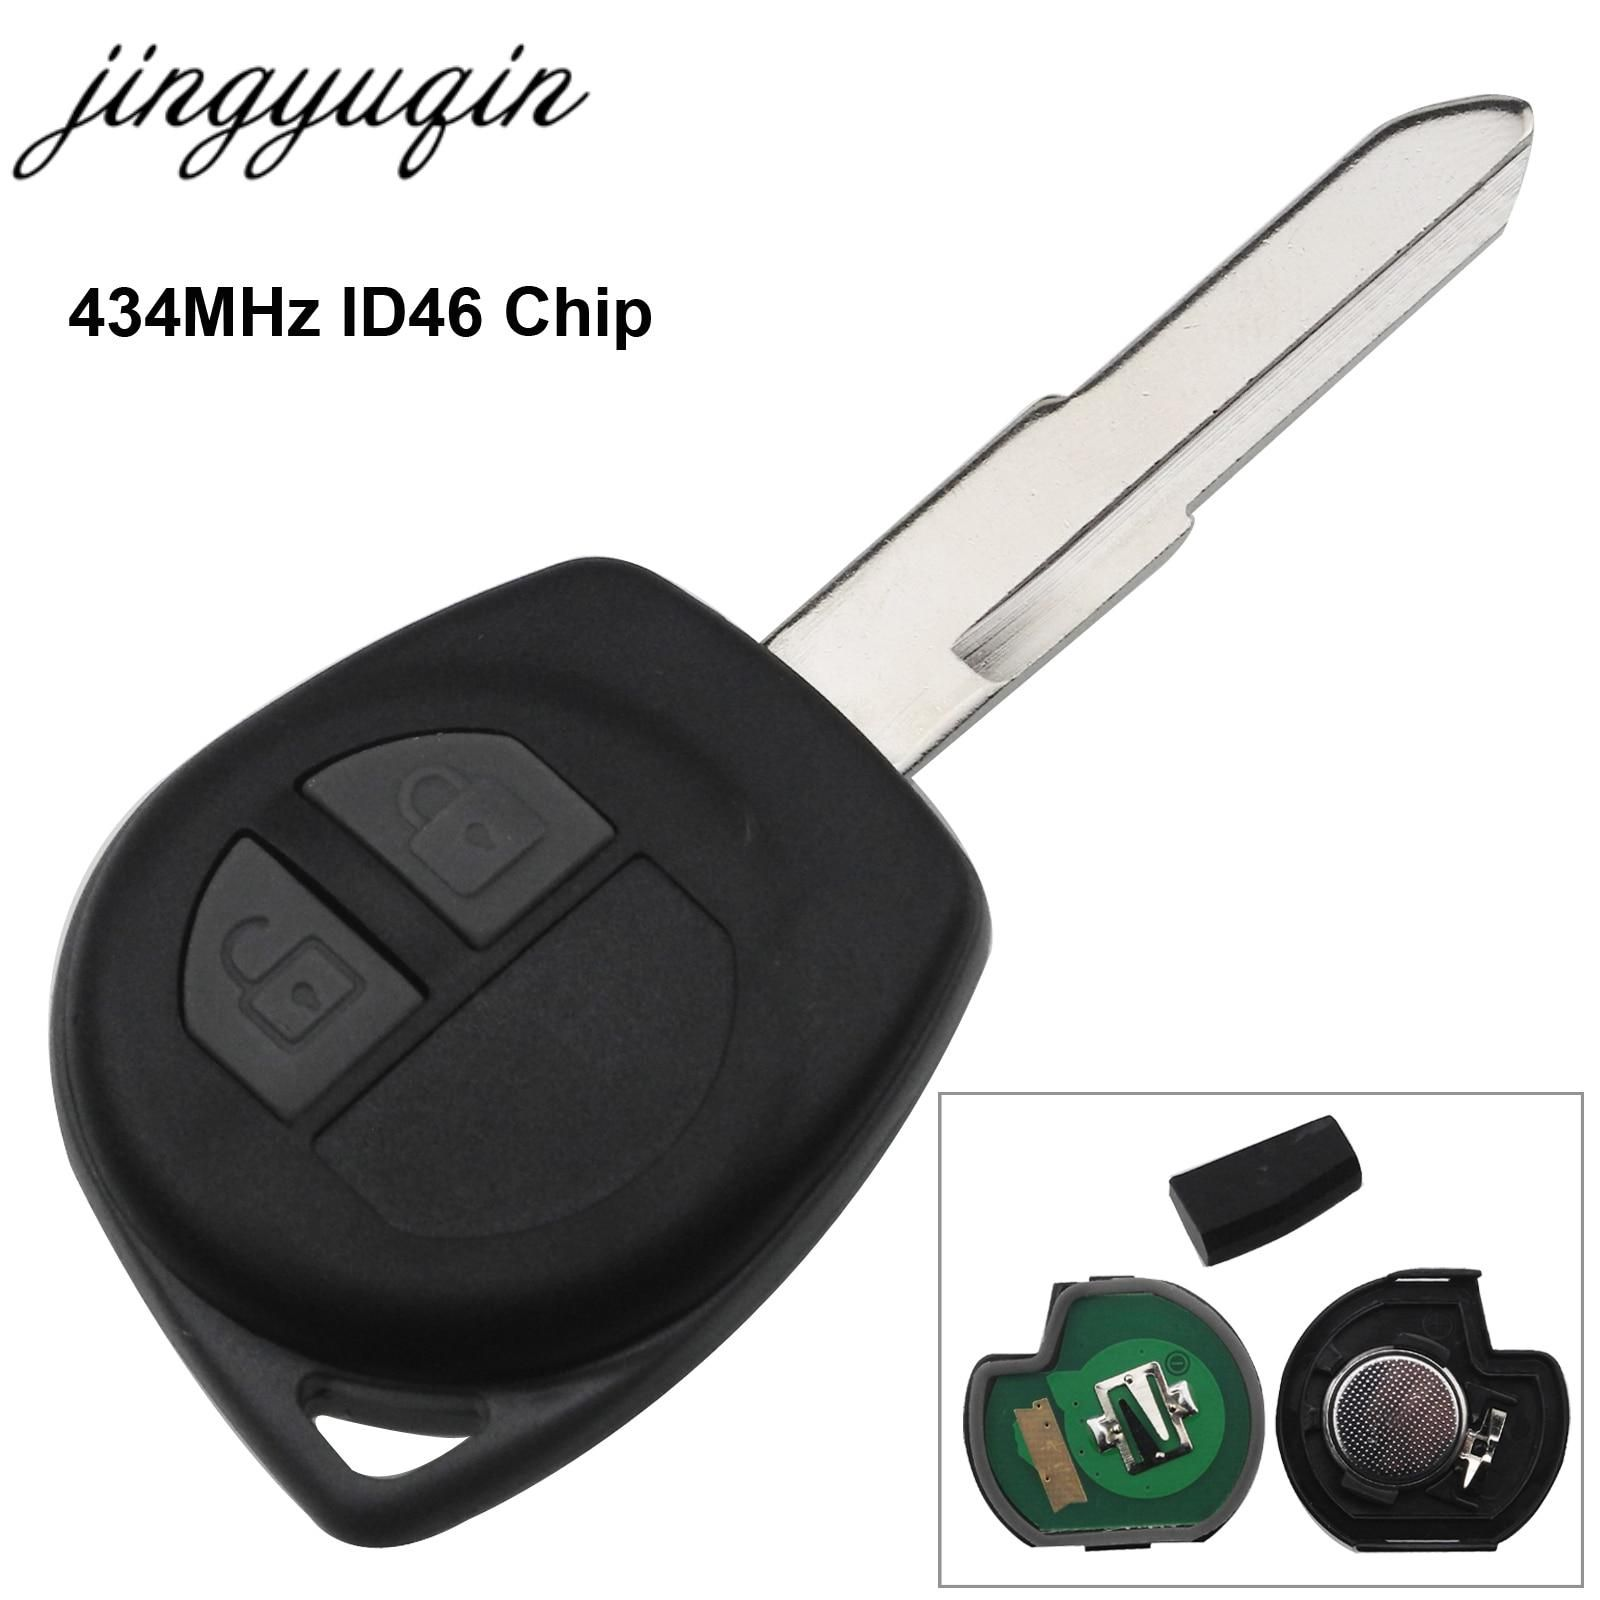 Jingyuqin Car Remote Key Fit For Suzuki Swift Sx4 Alto Vitara